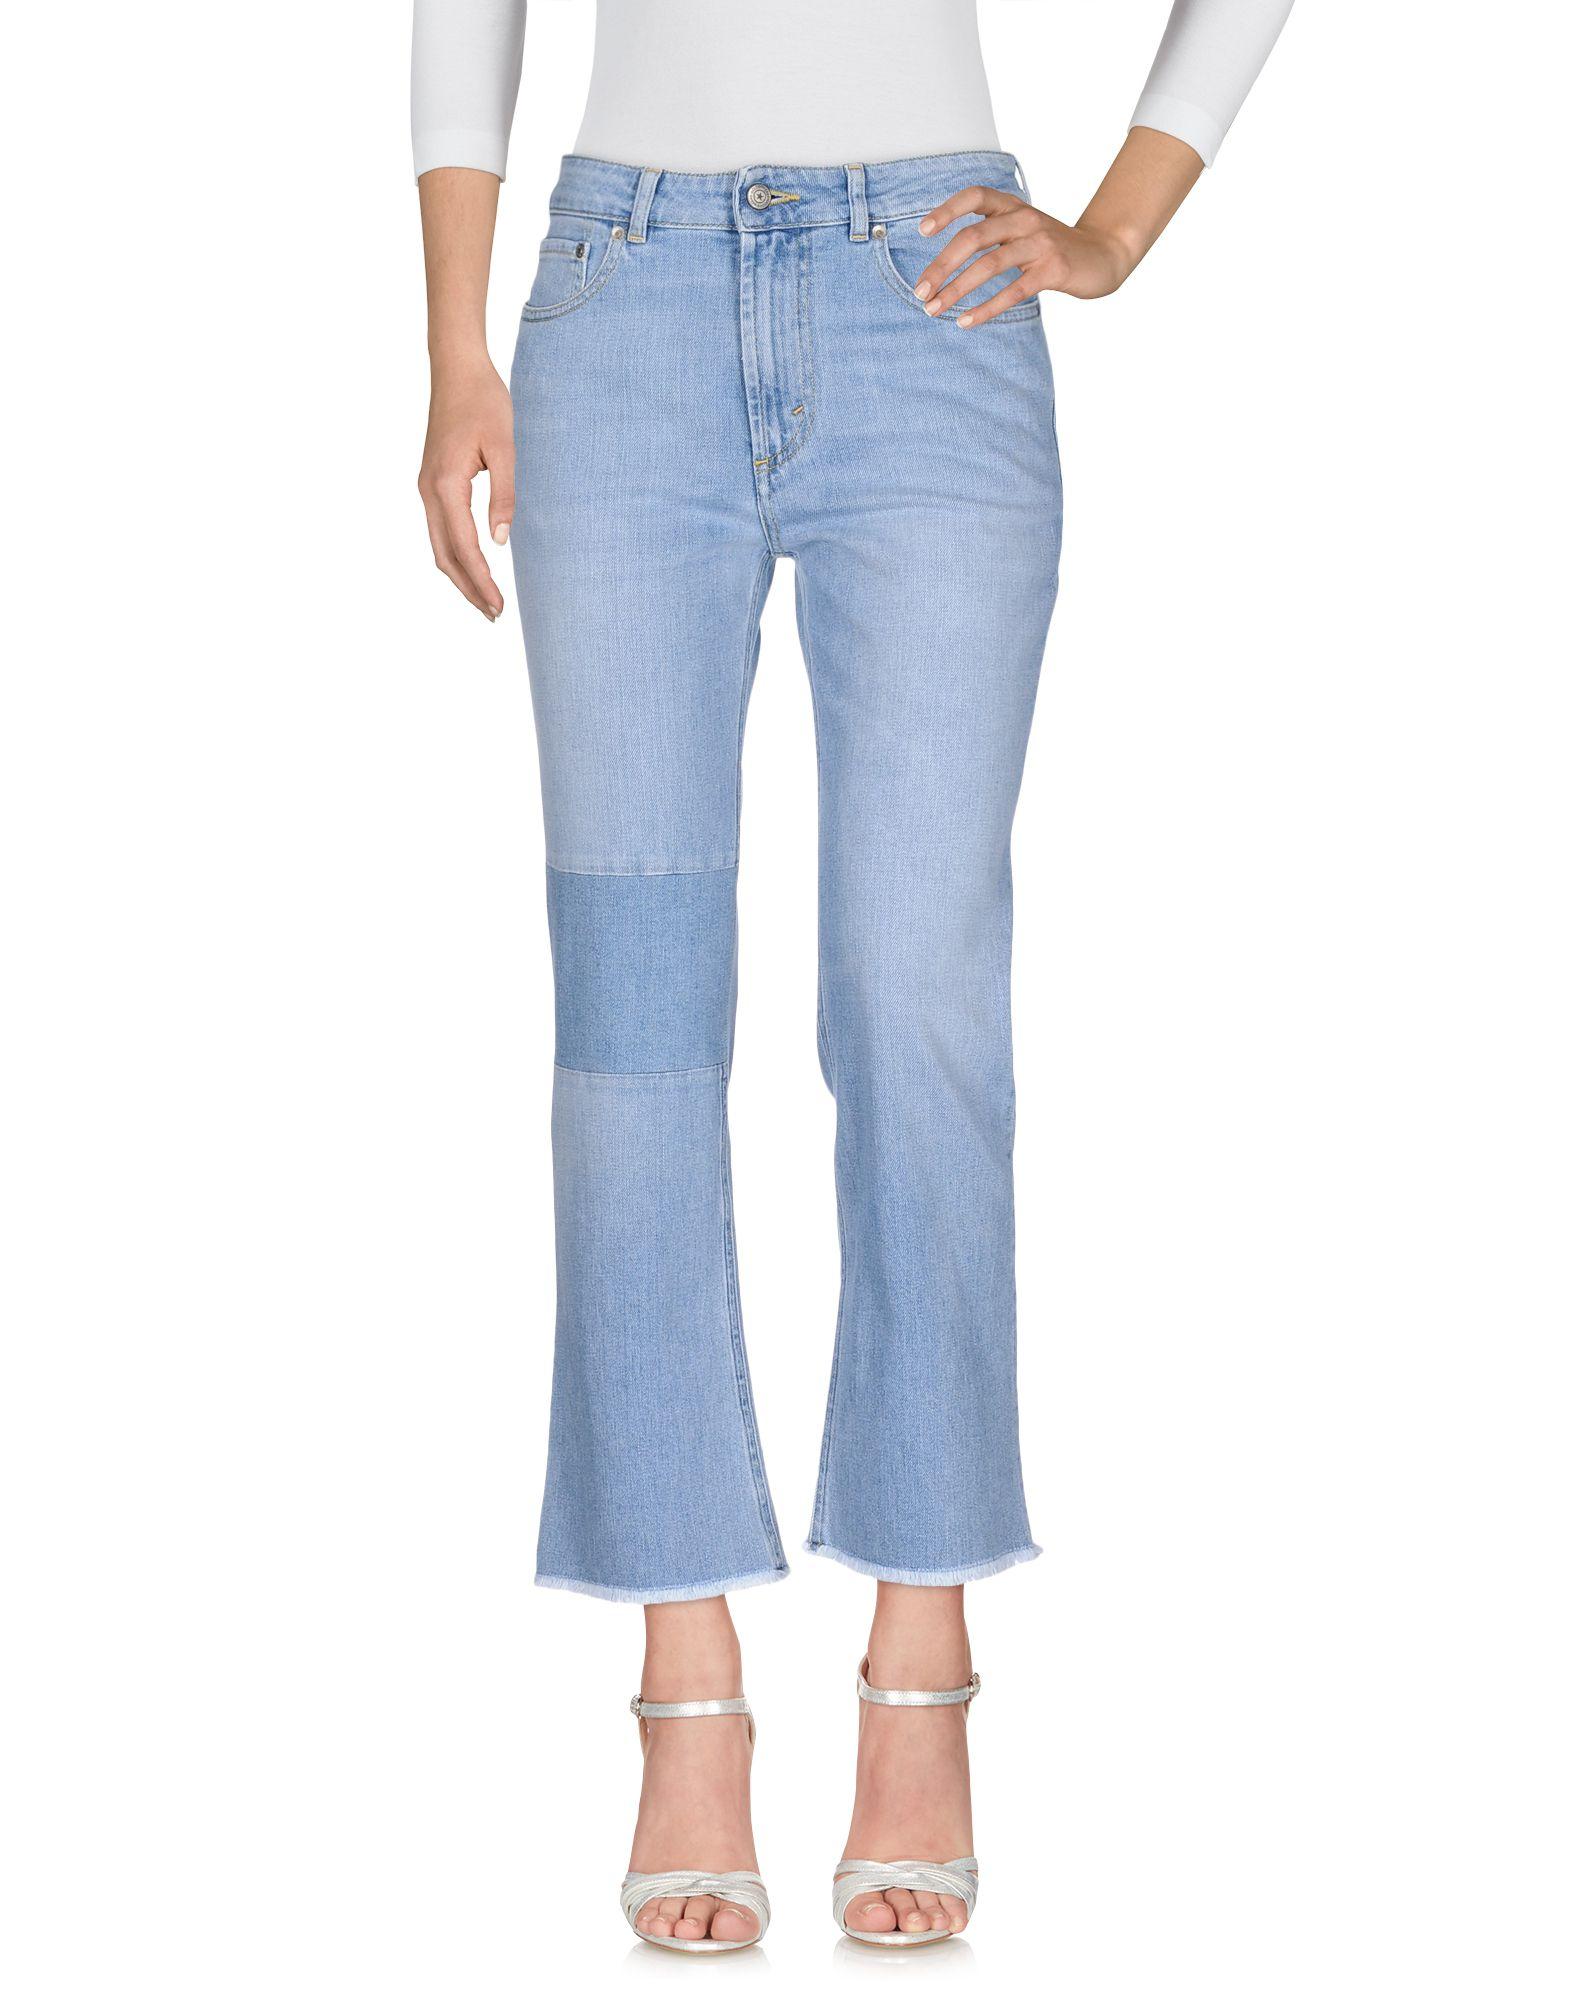 Pantaloni Jeans Golden Goose Deluxe Brand Donna - Acquista online su